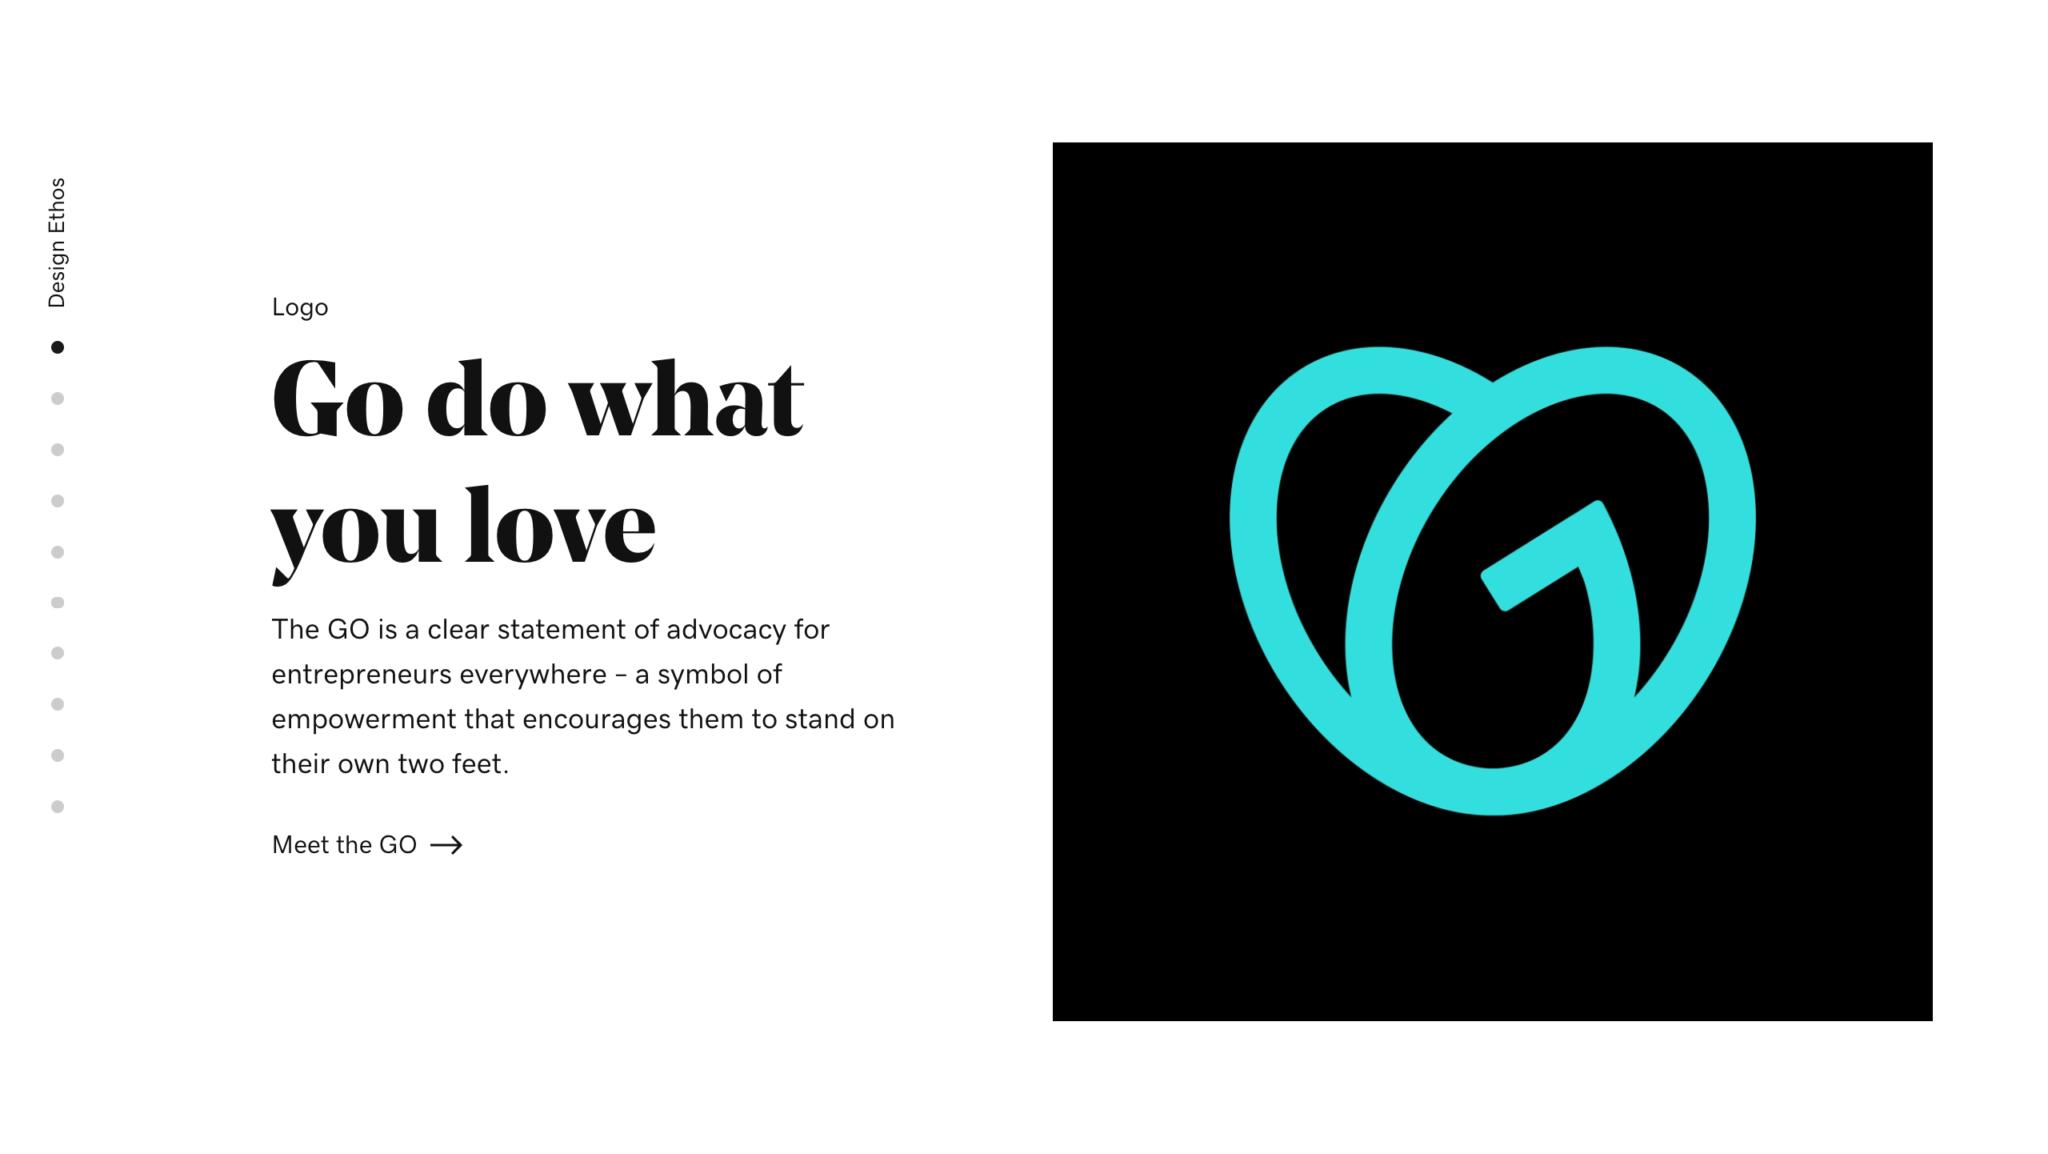 godaddy new logo